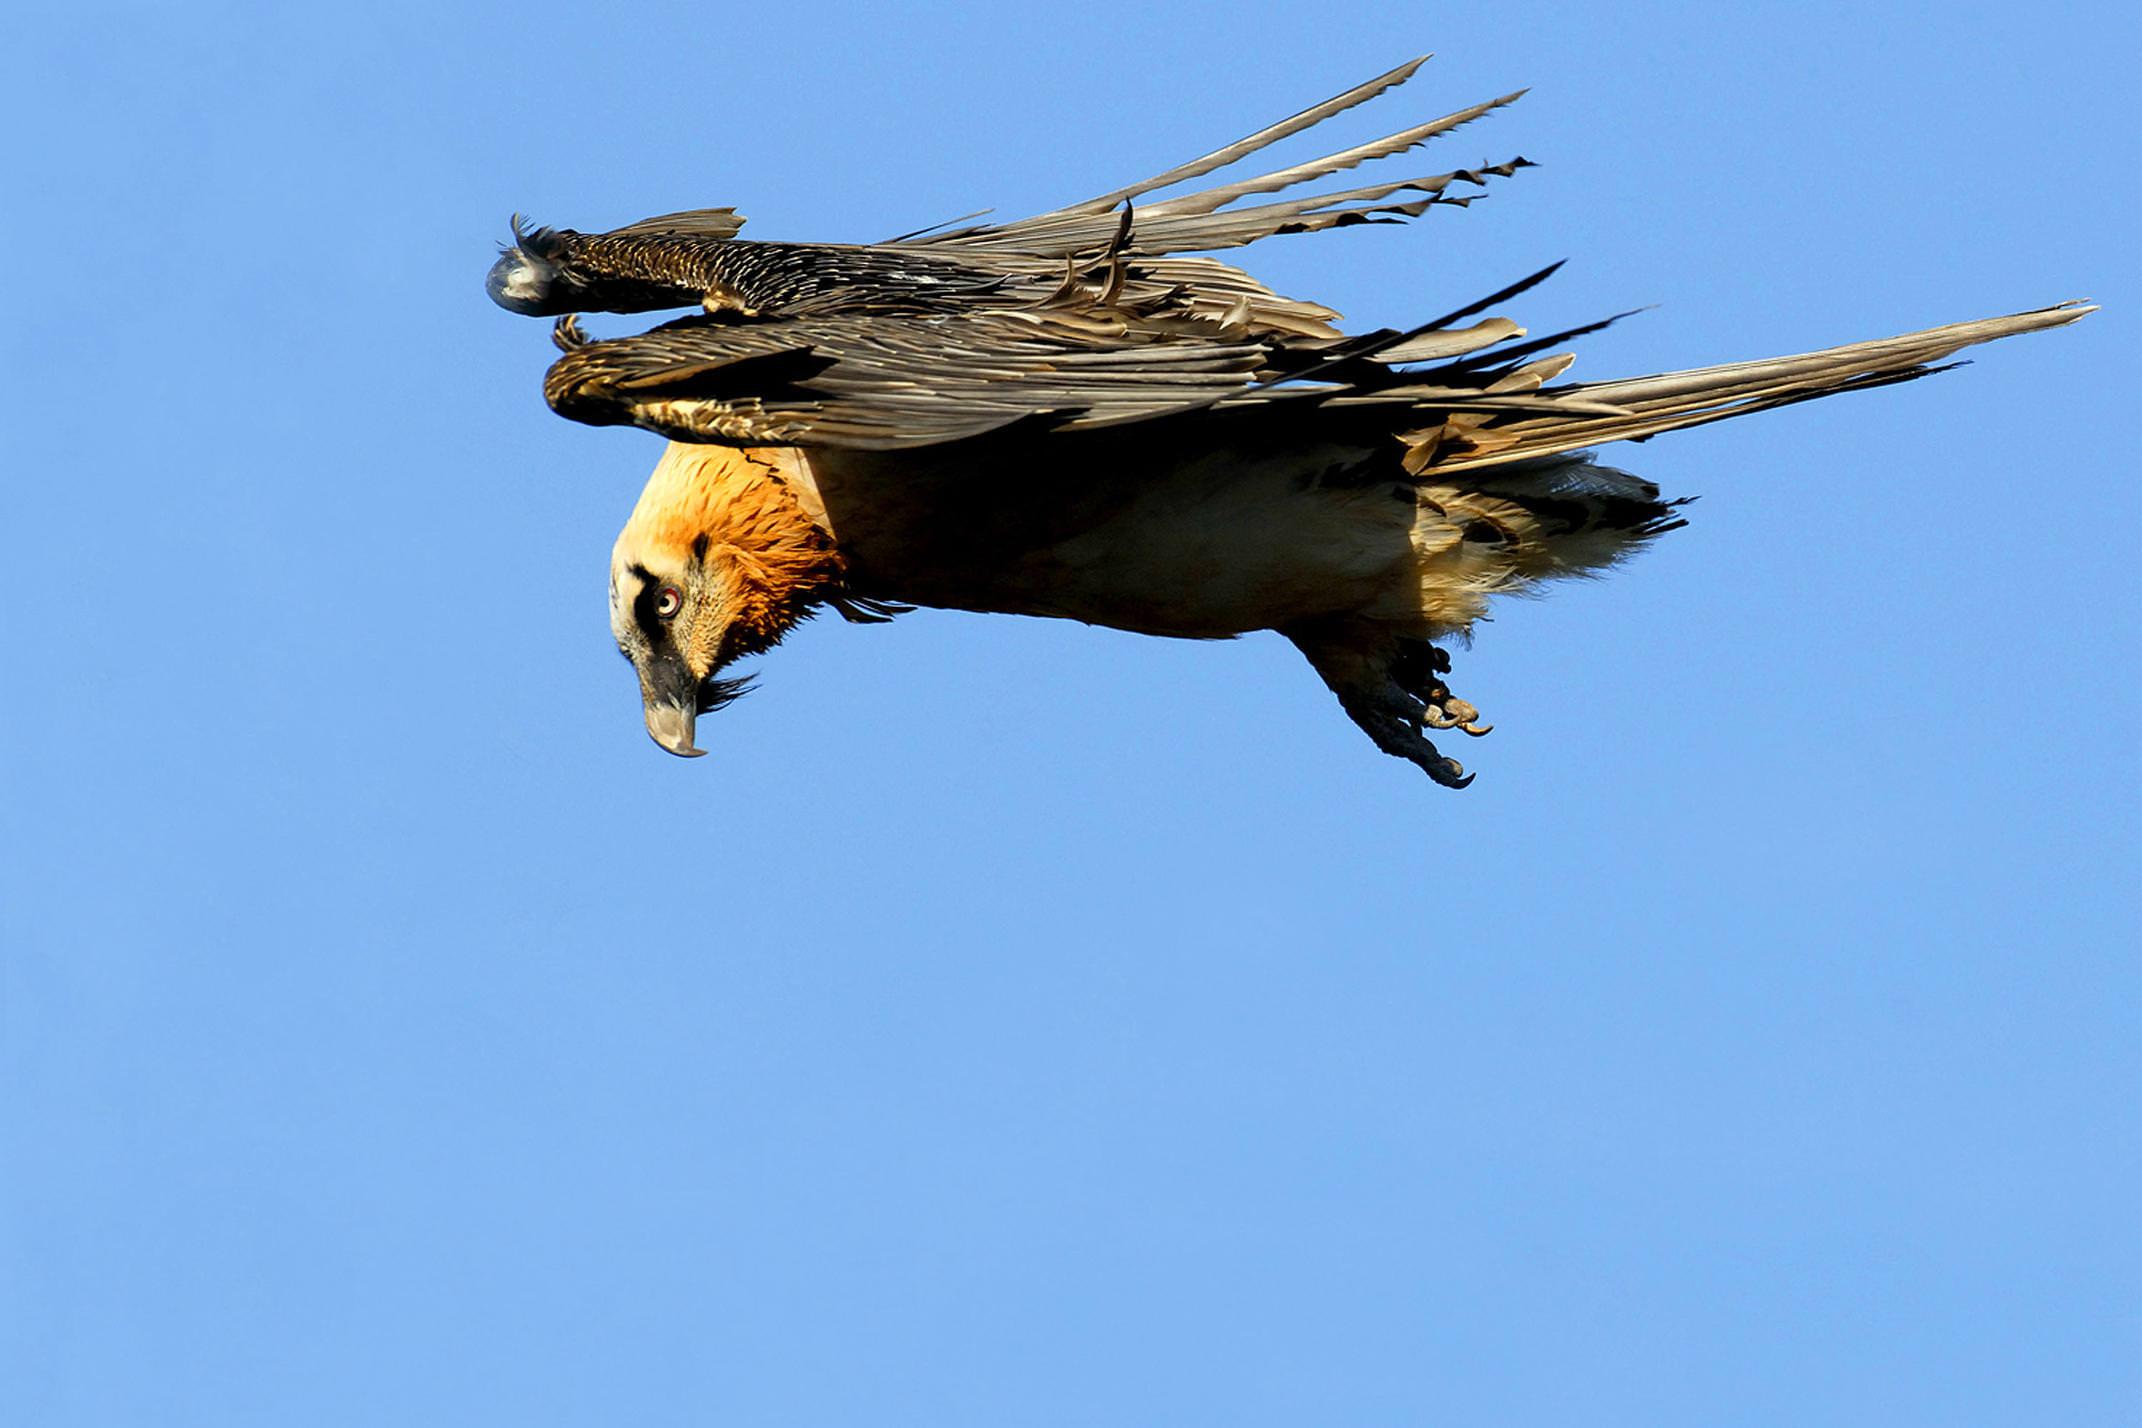 Spain huesca pyrenees ordesa birdwatching beardedvulture c jpablo25